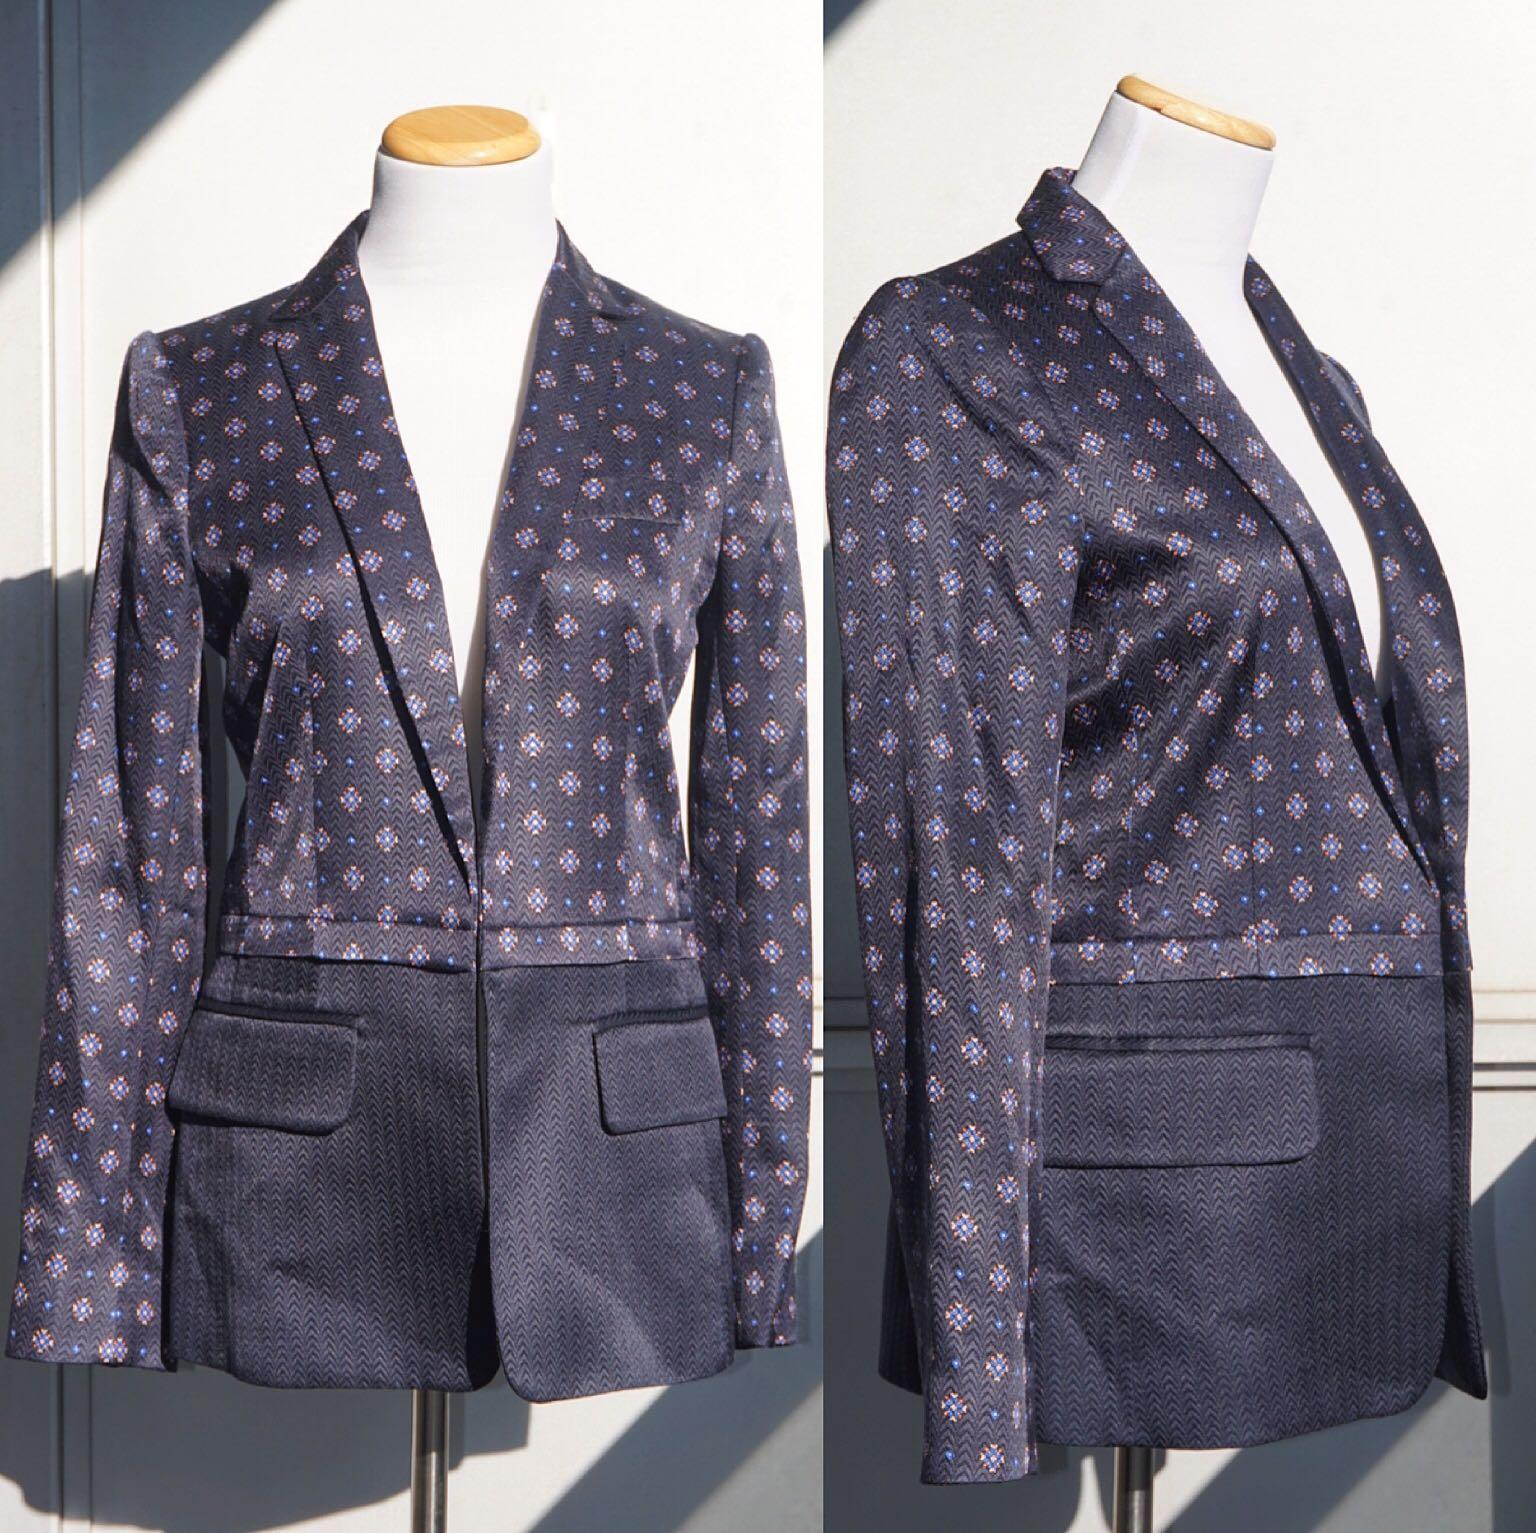 *NWT* Club Monaco 'Alison' Silk & Wool Blazer Women Size 2